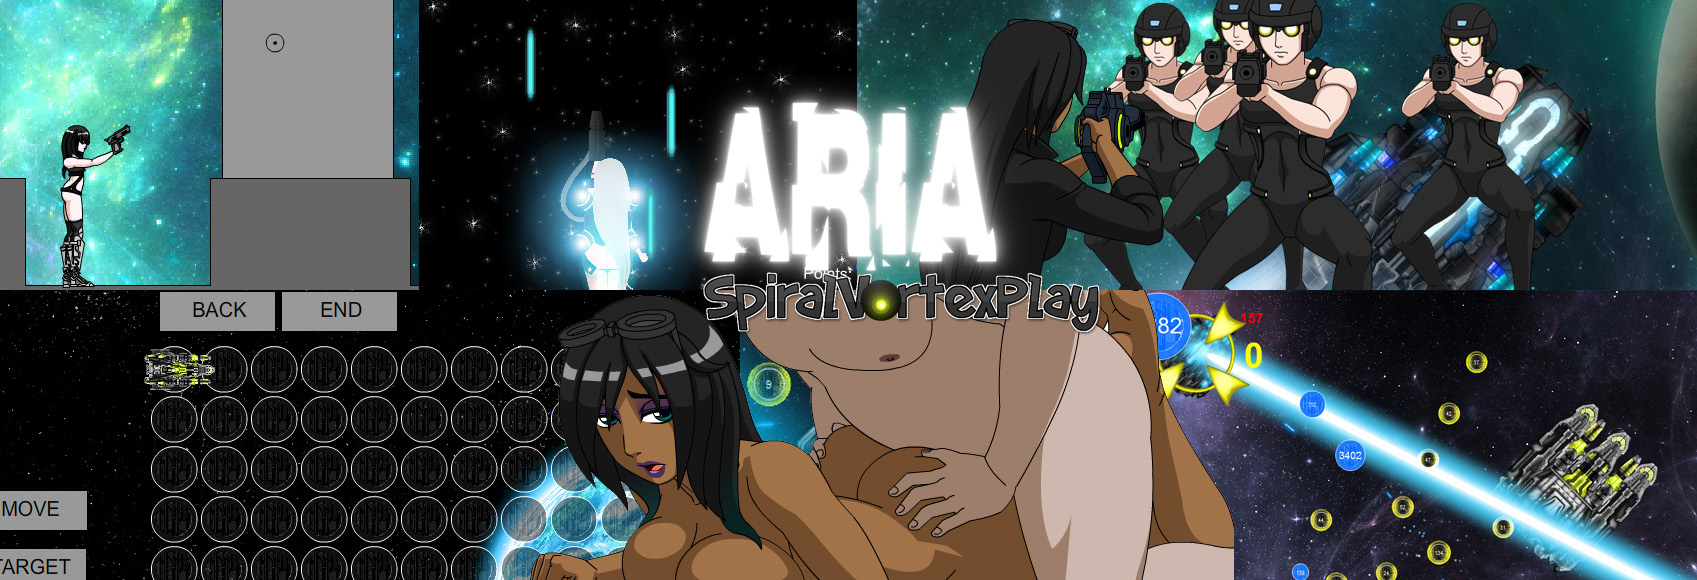 aria_prev